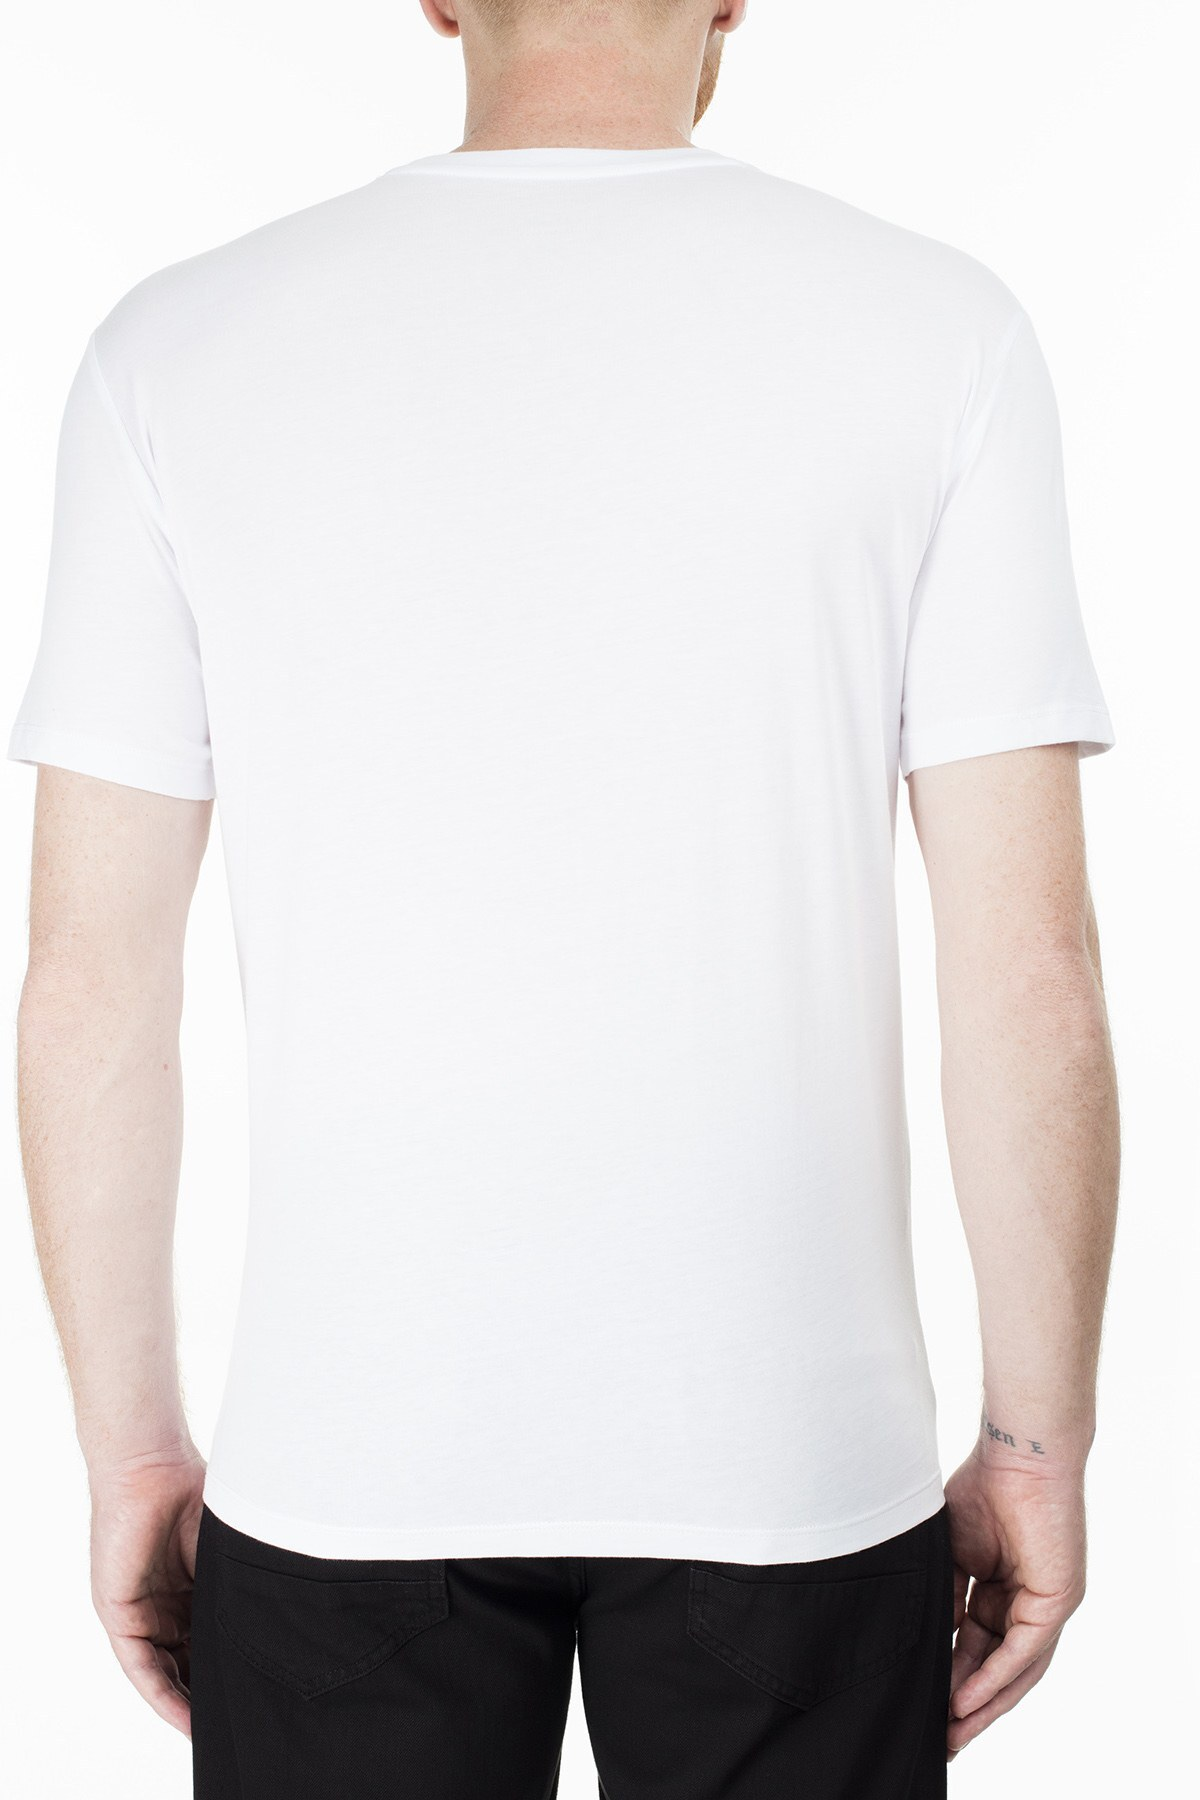 Armani Exchange Erkek T Shirt 3HZTGF ZJH4Z 1100 BEYAZ